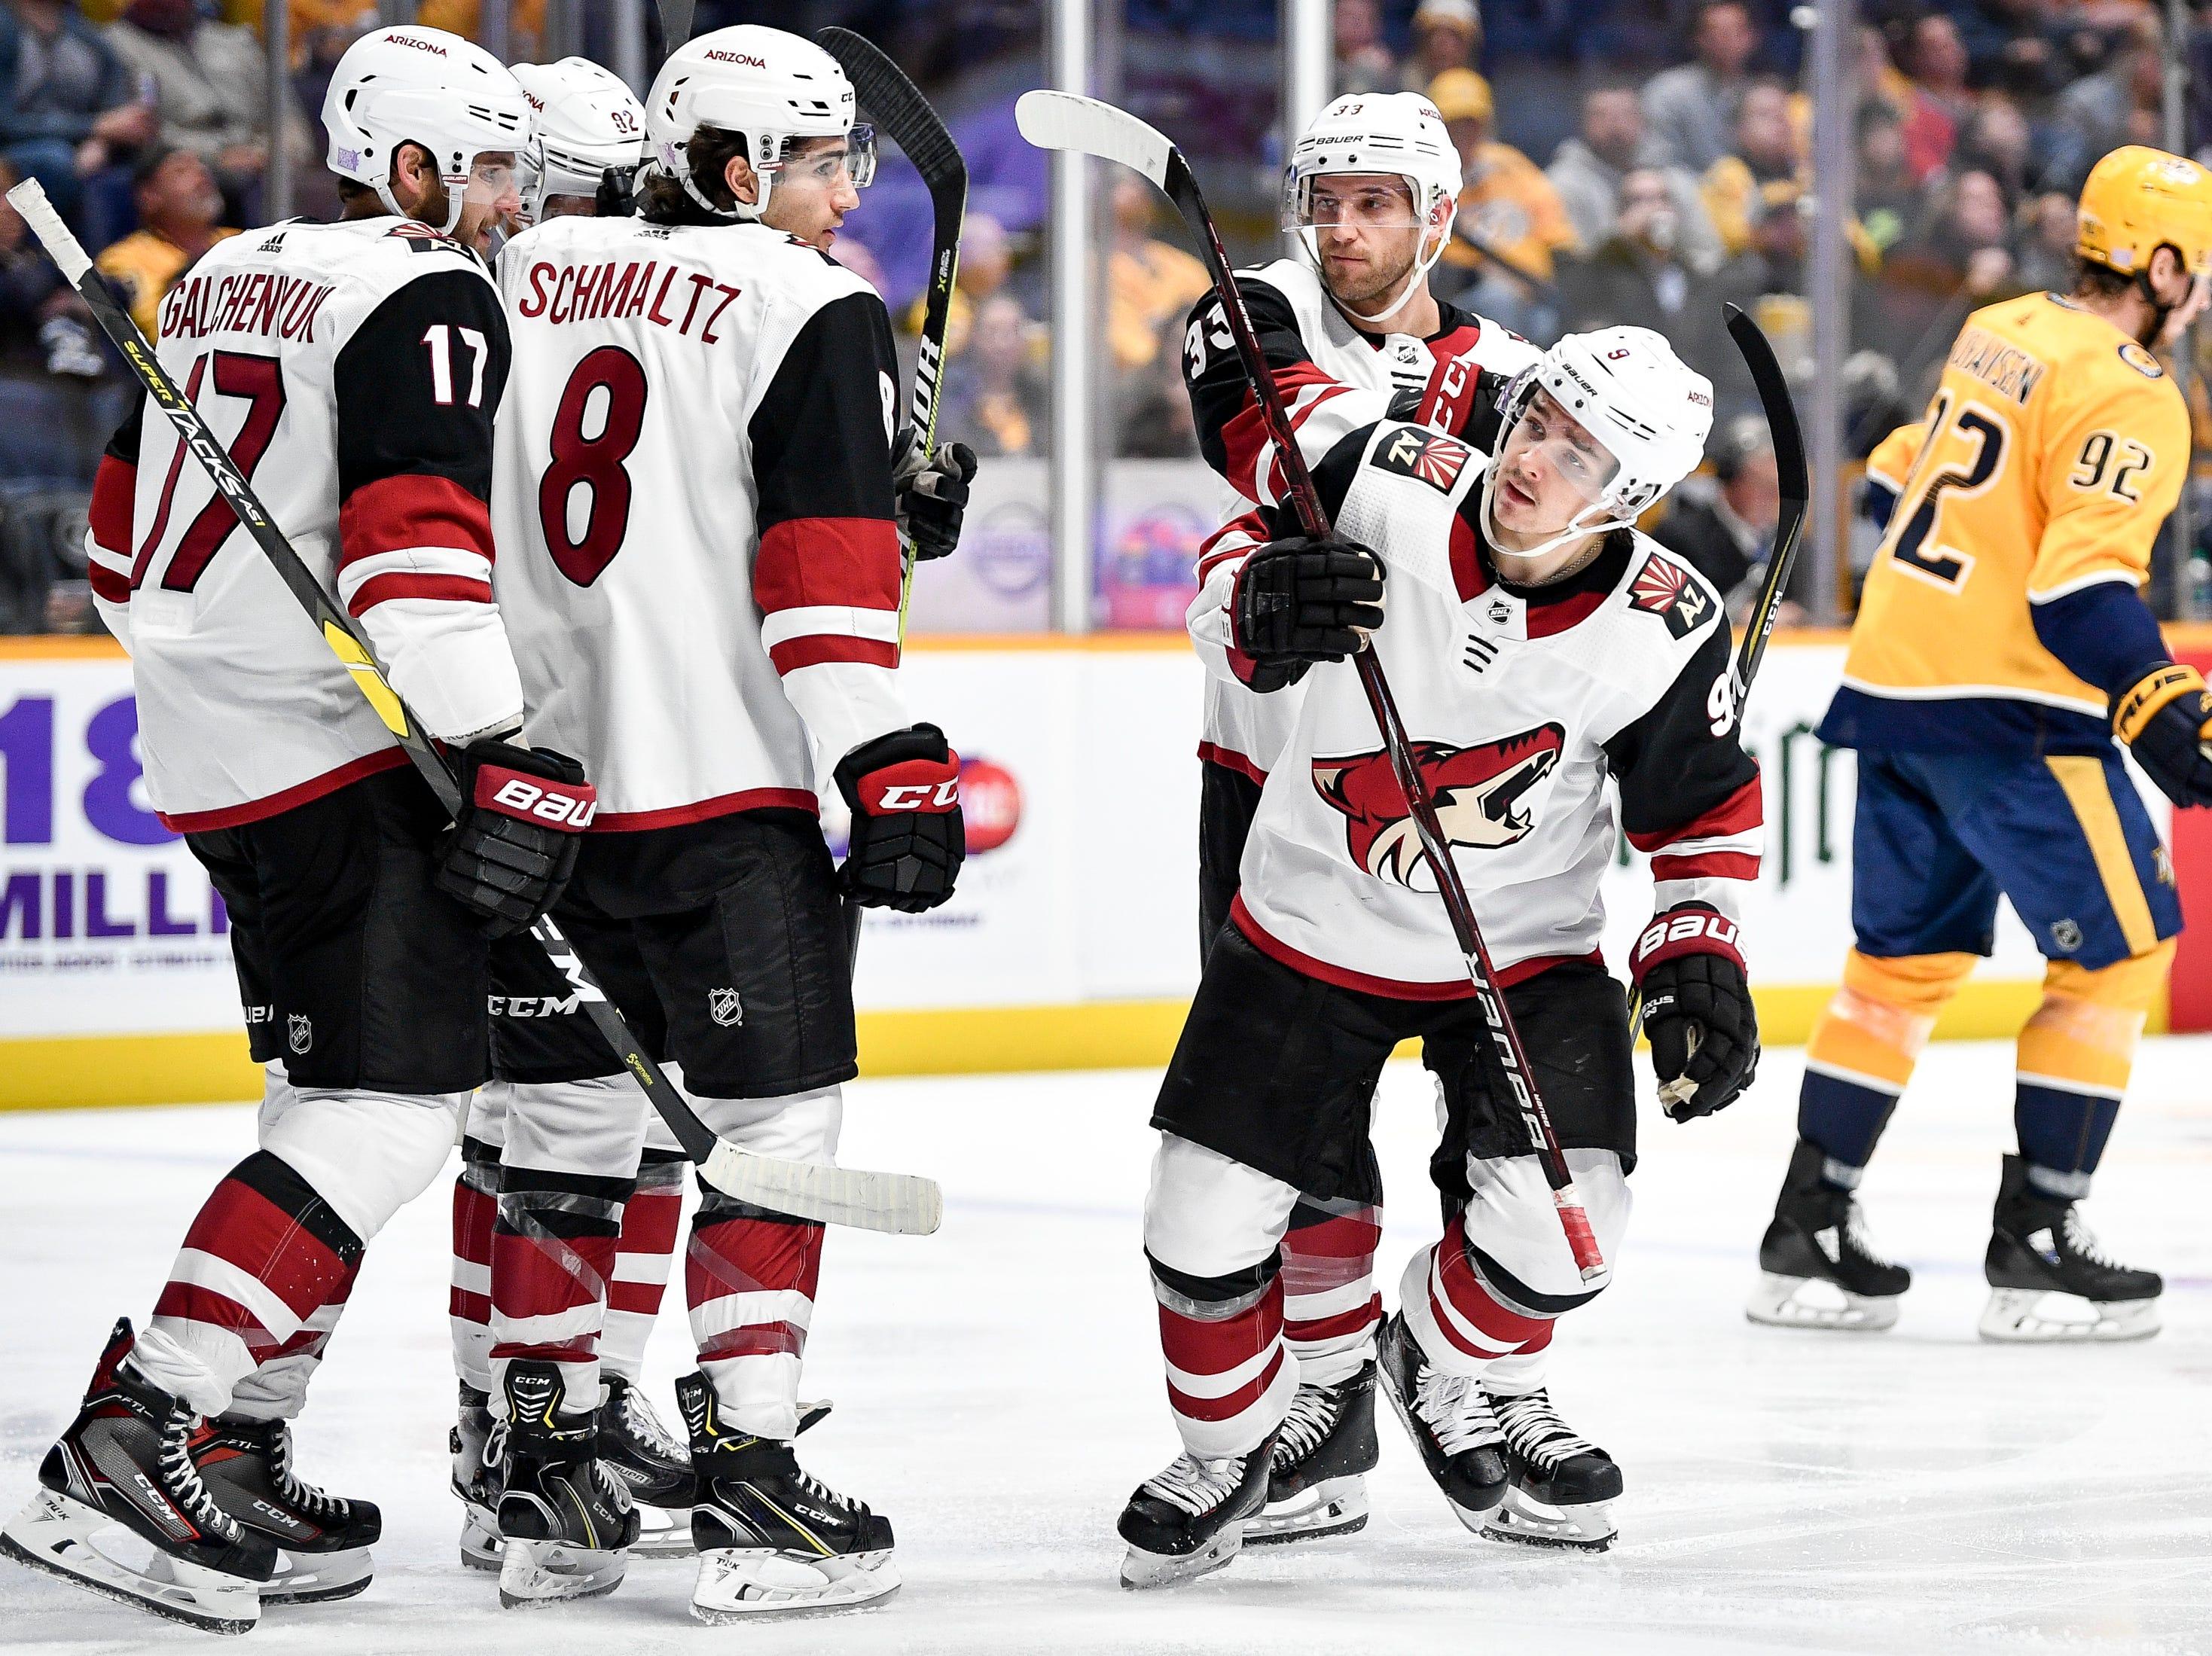 Arizona Coyotes center Clayton Keller (9) reacts to scoring against the Nashville Predators during the second period at Bridgestone Arena in Nashville, Tenn., Thursday, Nov. 29, 2018.